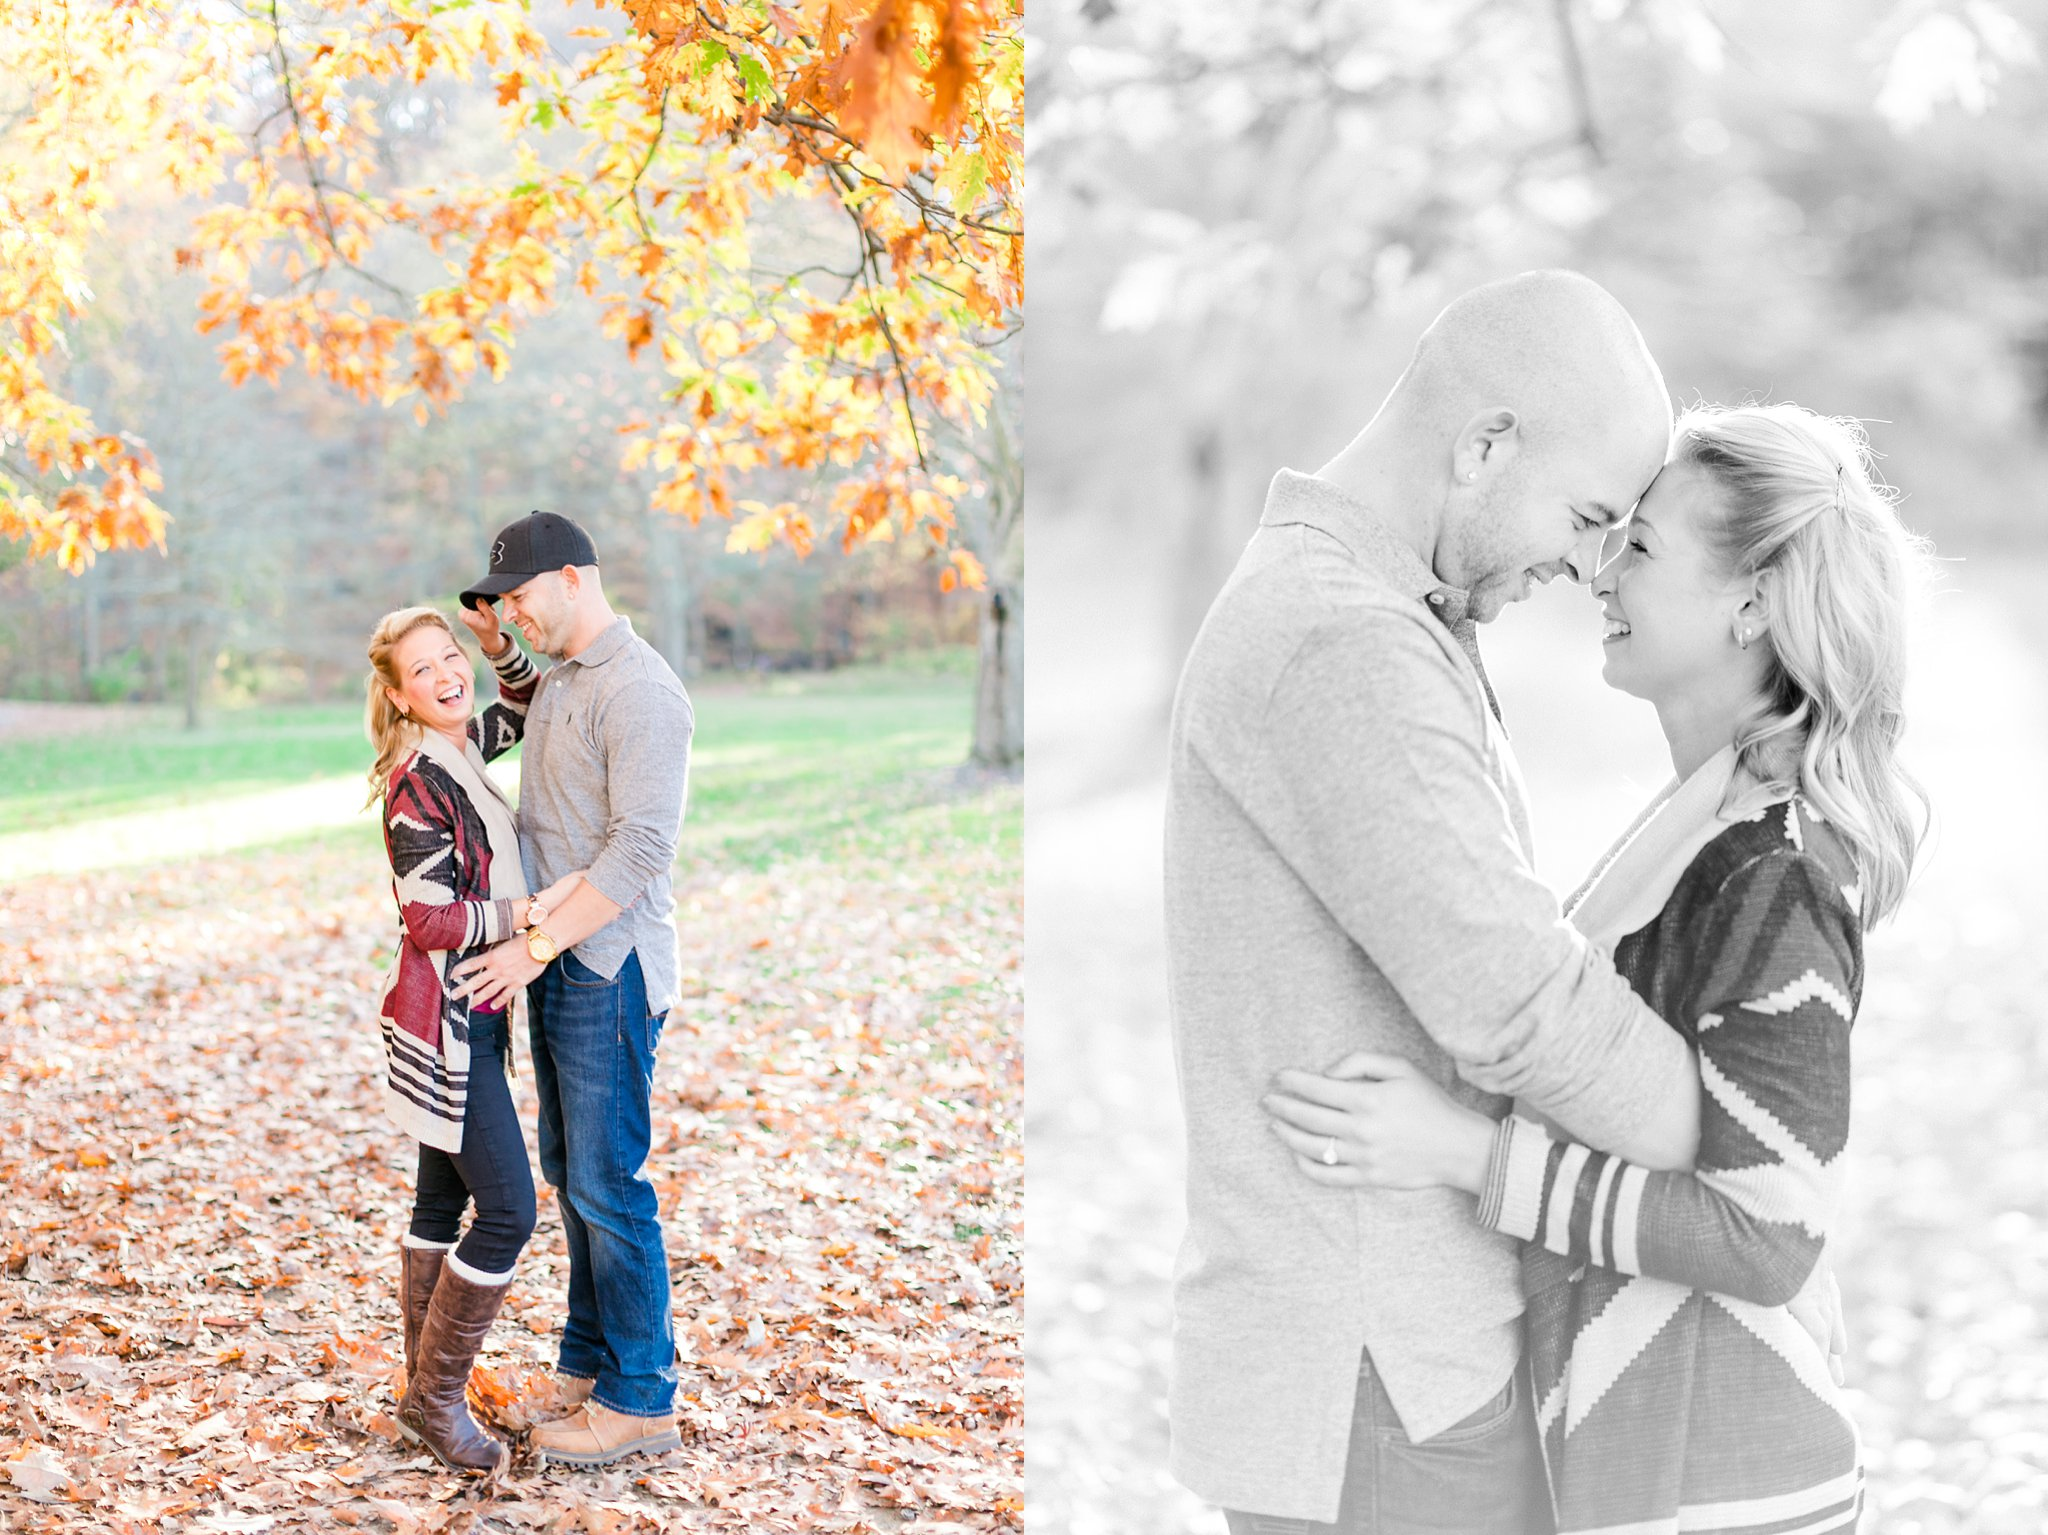 Rock Creek Park Engagement Photos DC Wedding Photographer Megan Kelsey Photography Katie & Conor-11.jpg